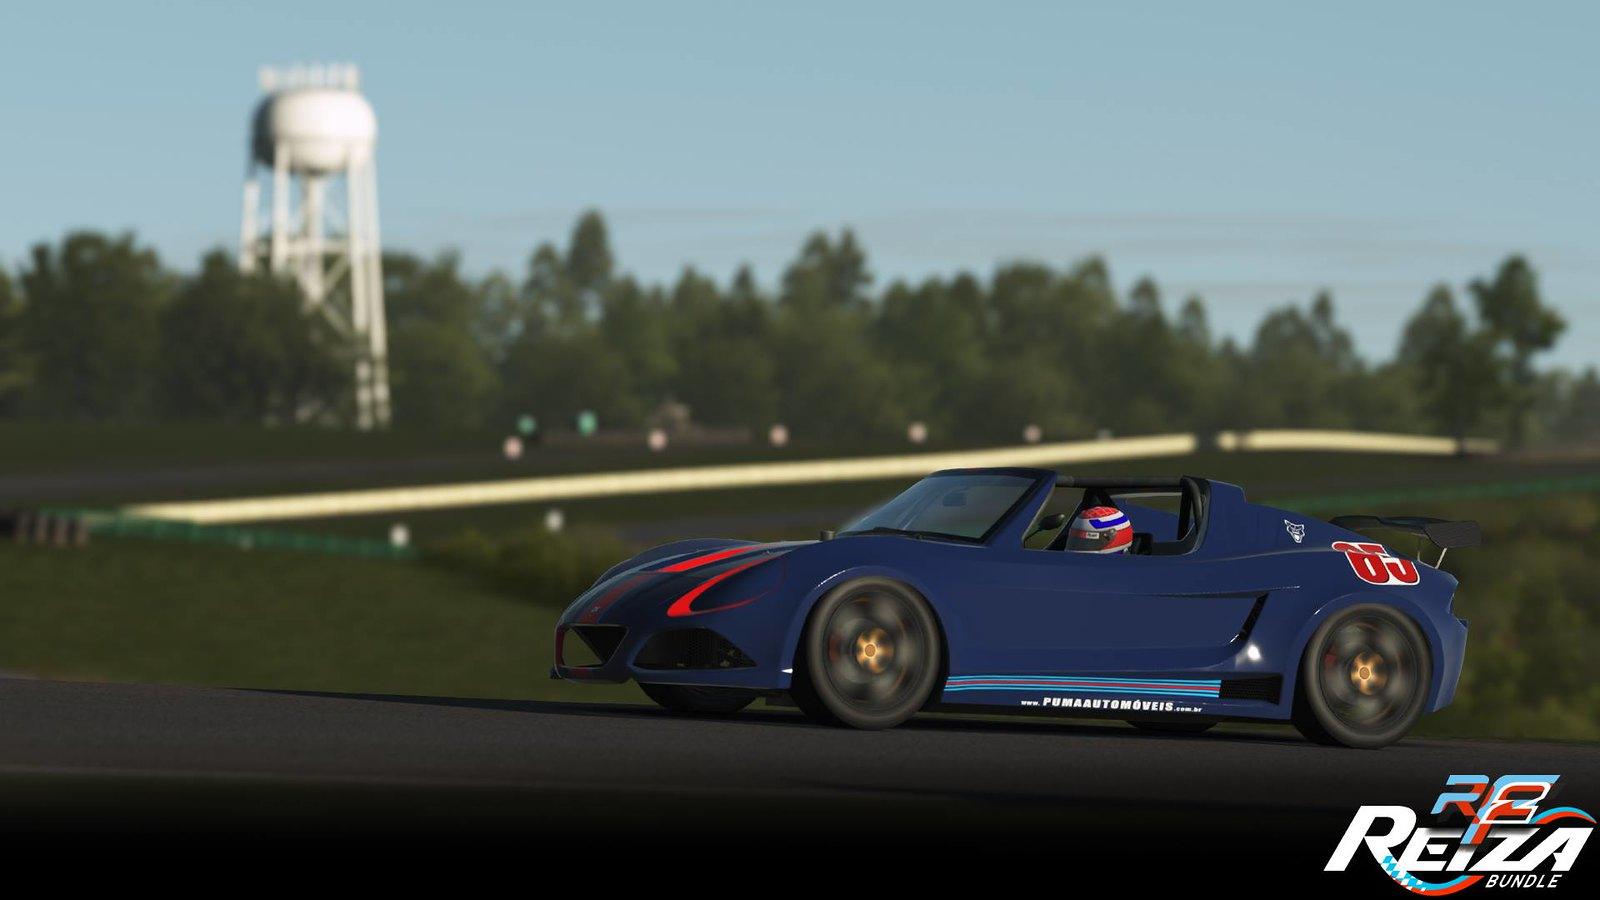 rFactor 2 - Reiza Bundle DLC VIRginia International Raceway Previews 10